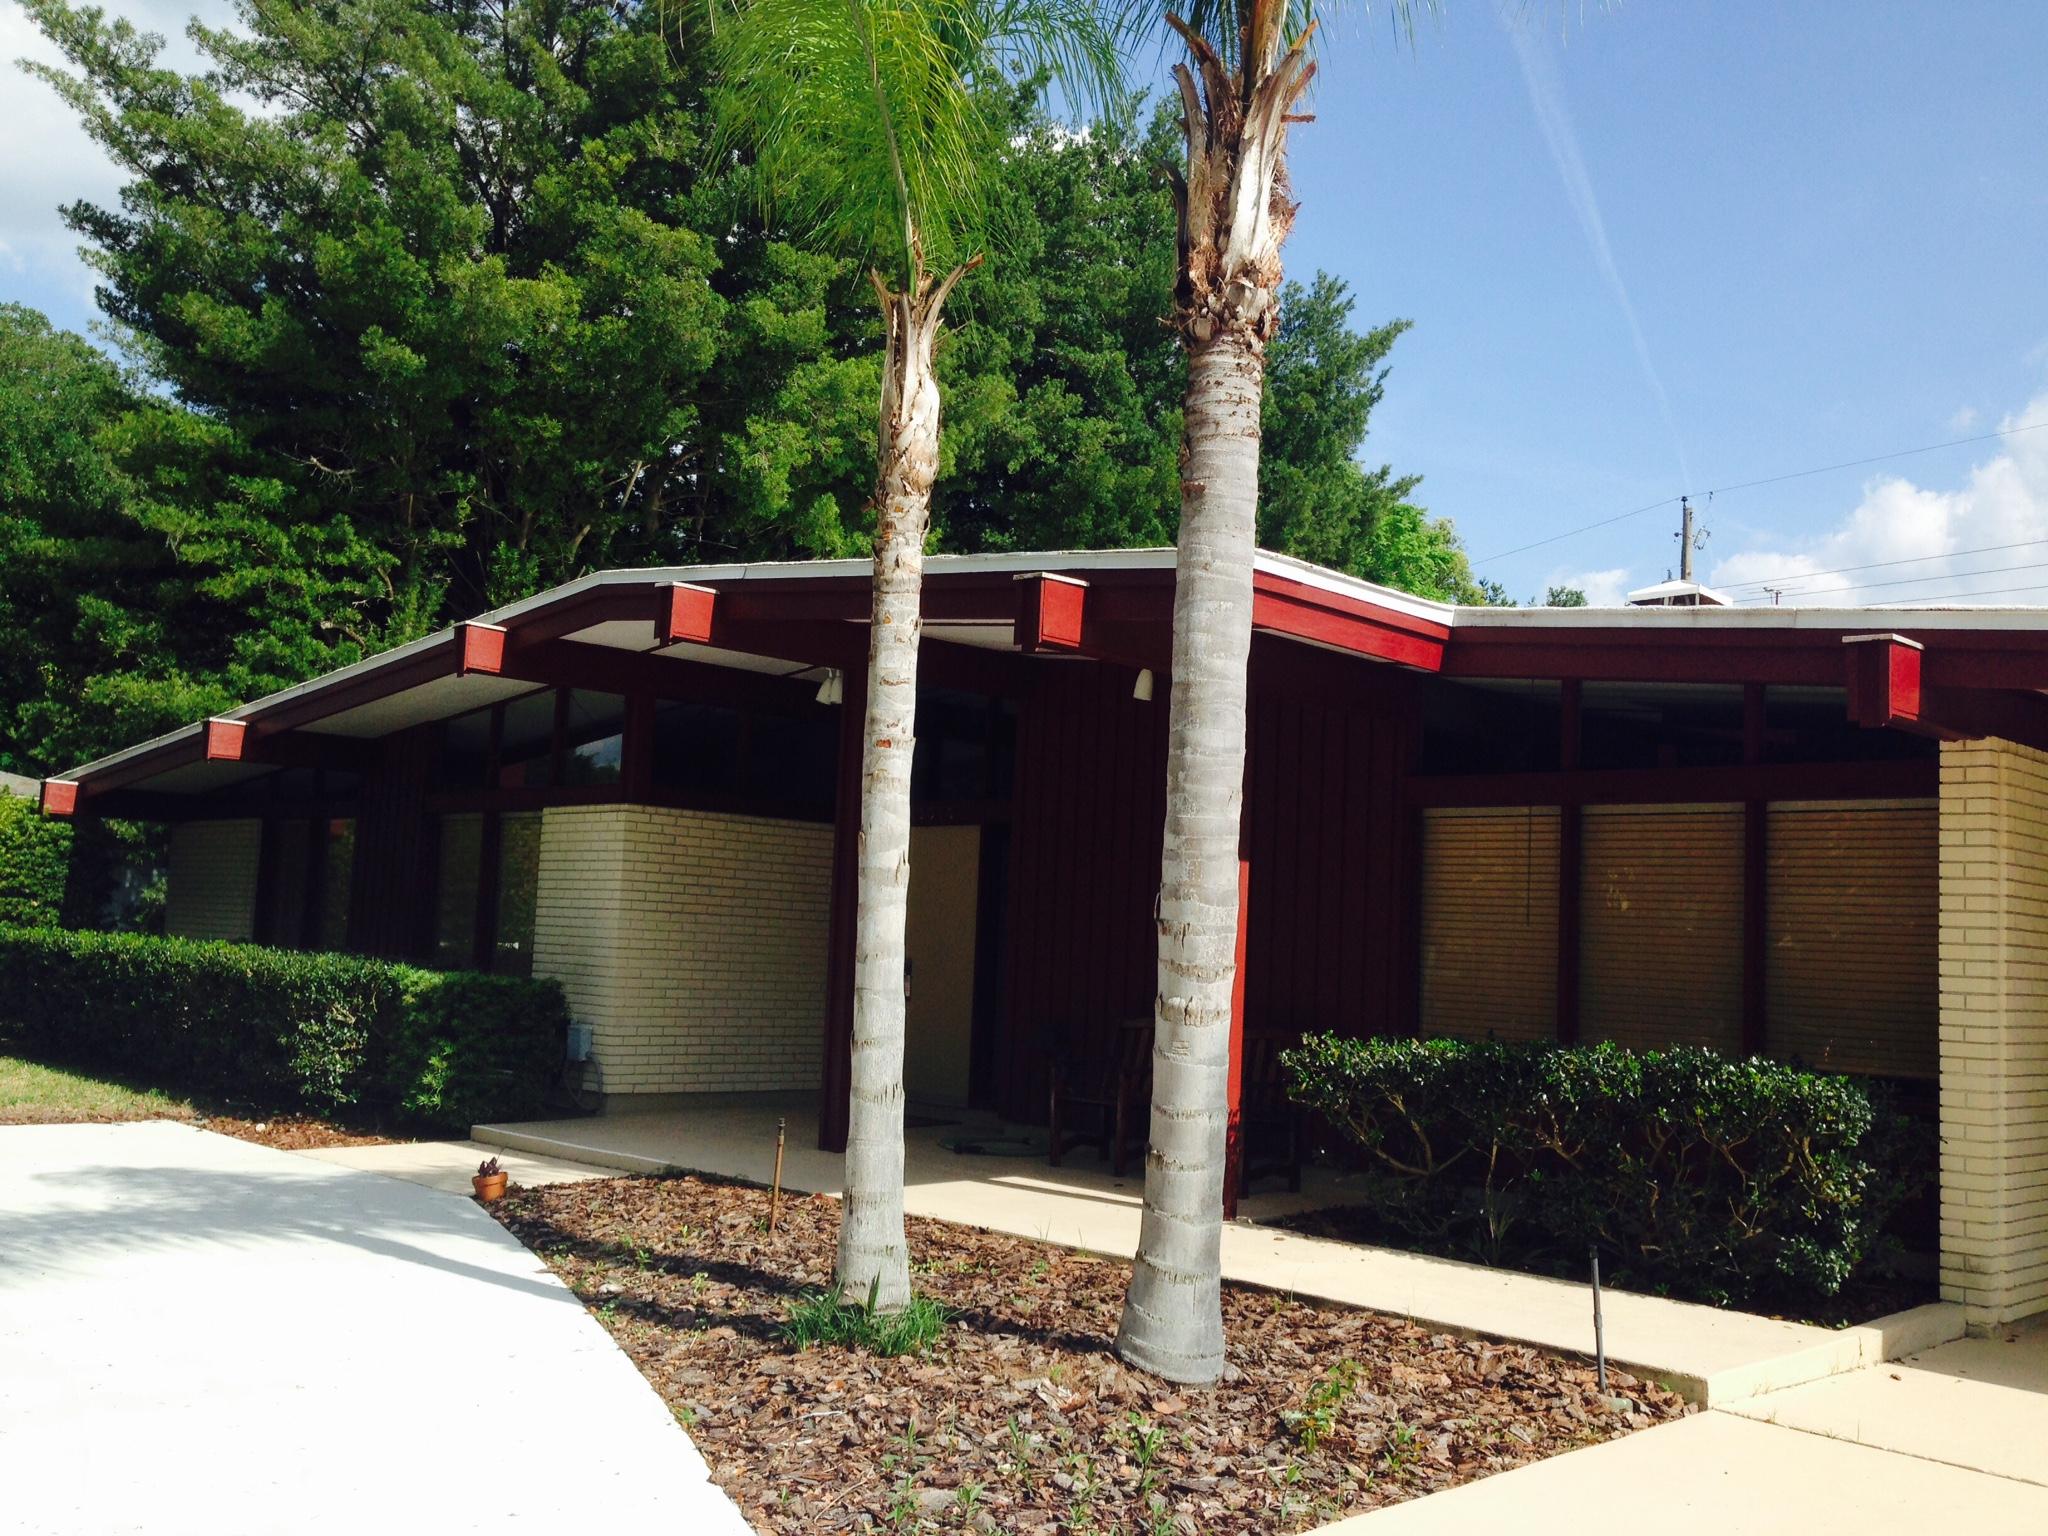 Marvelous Mid Century Modern Homes Jacksonville Fl Pictures - Simple ...